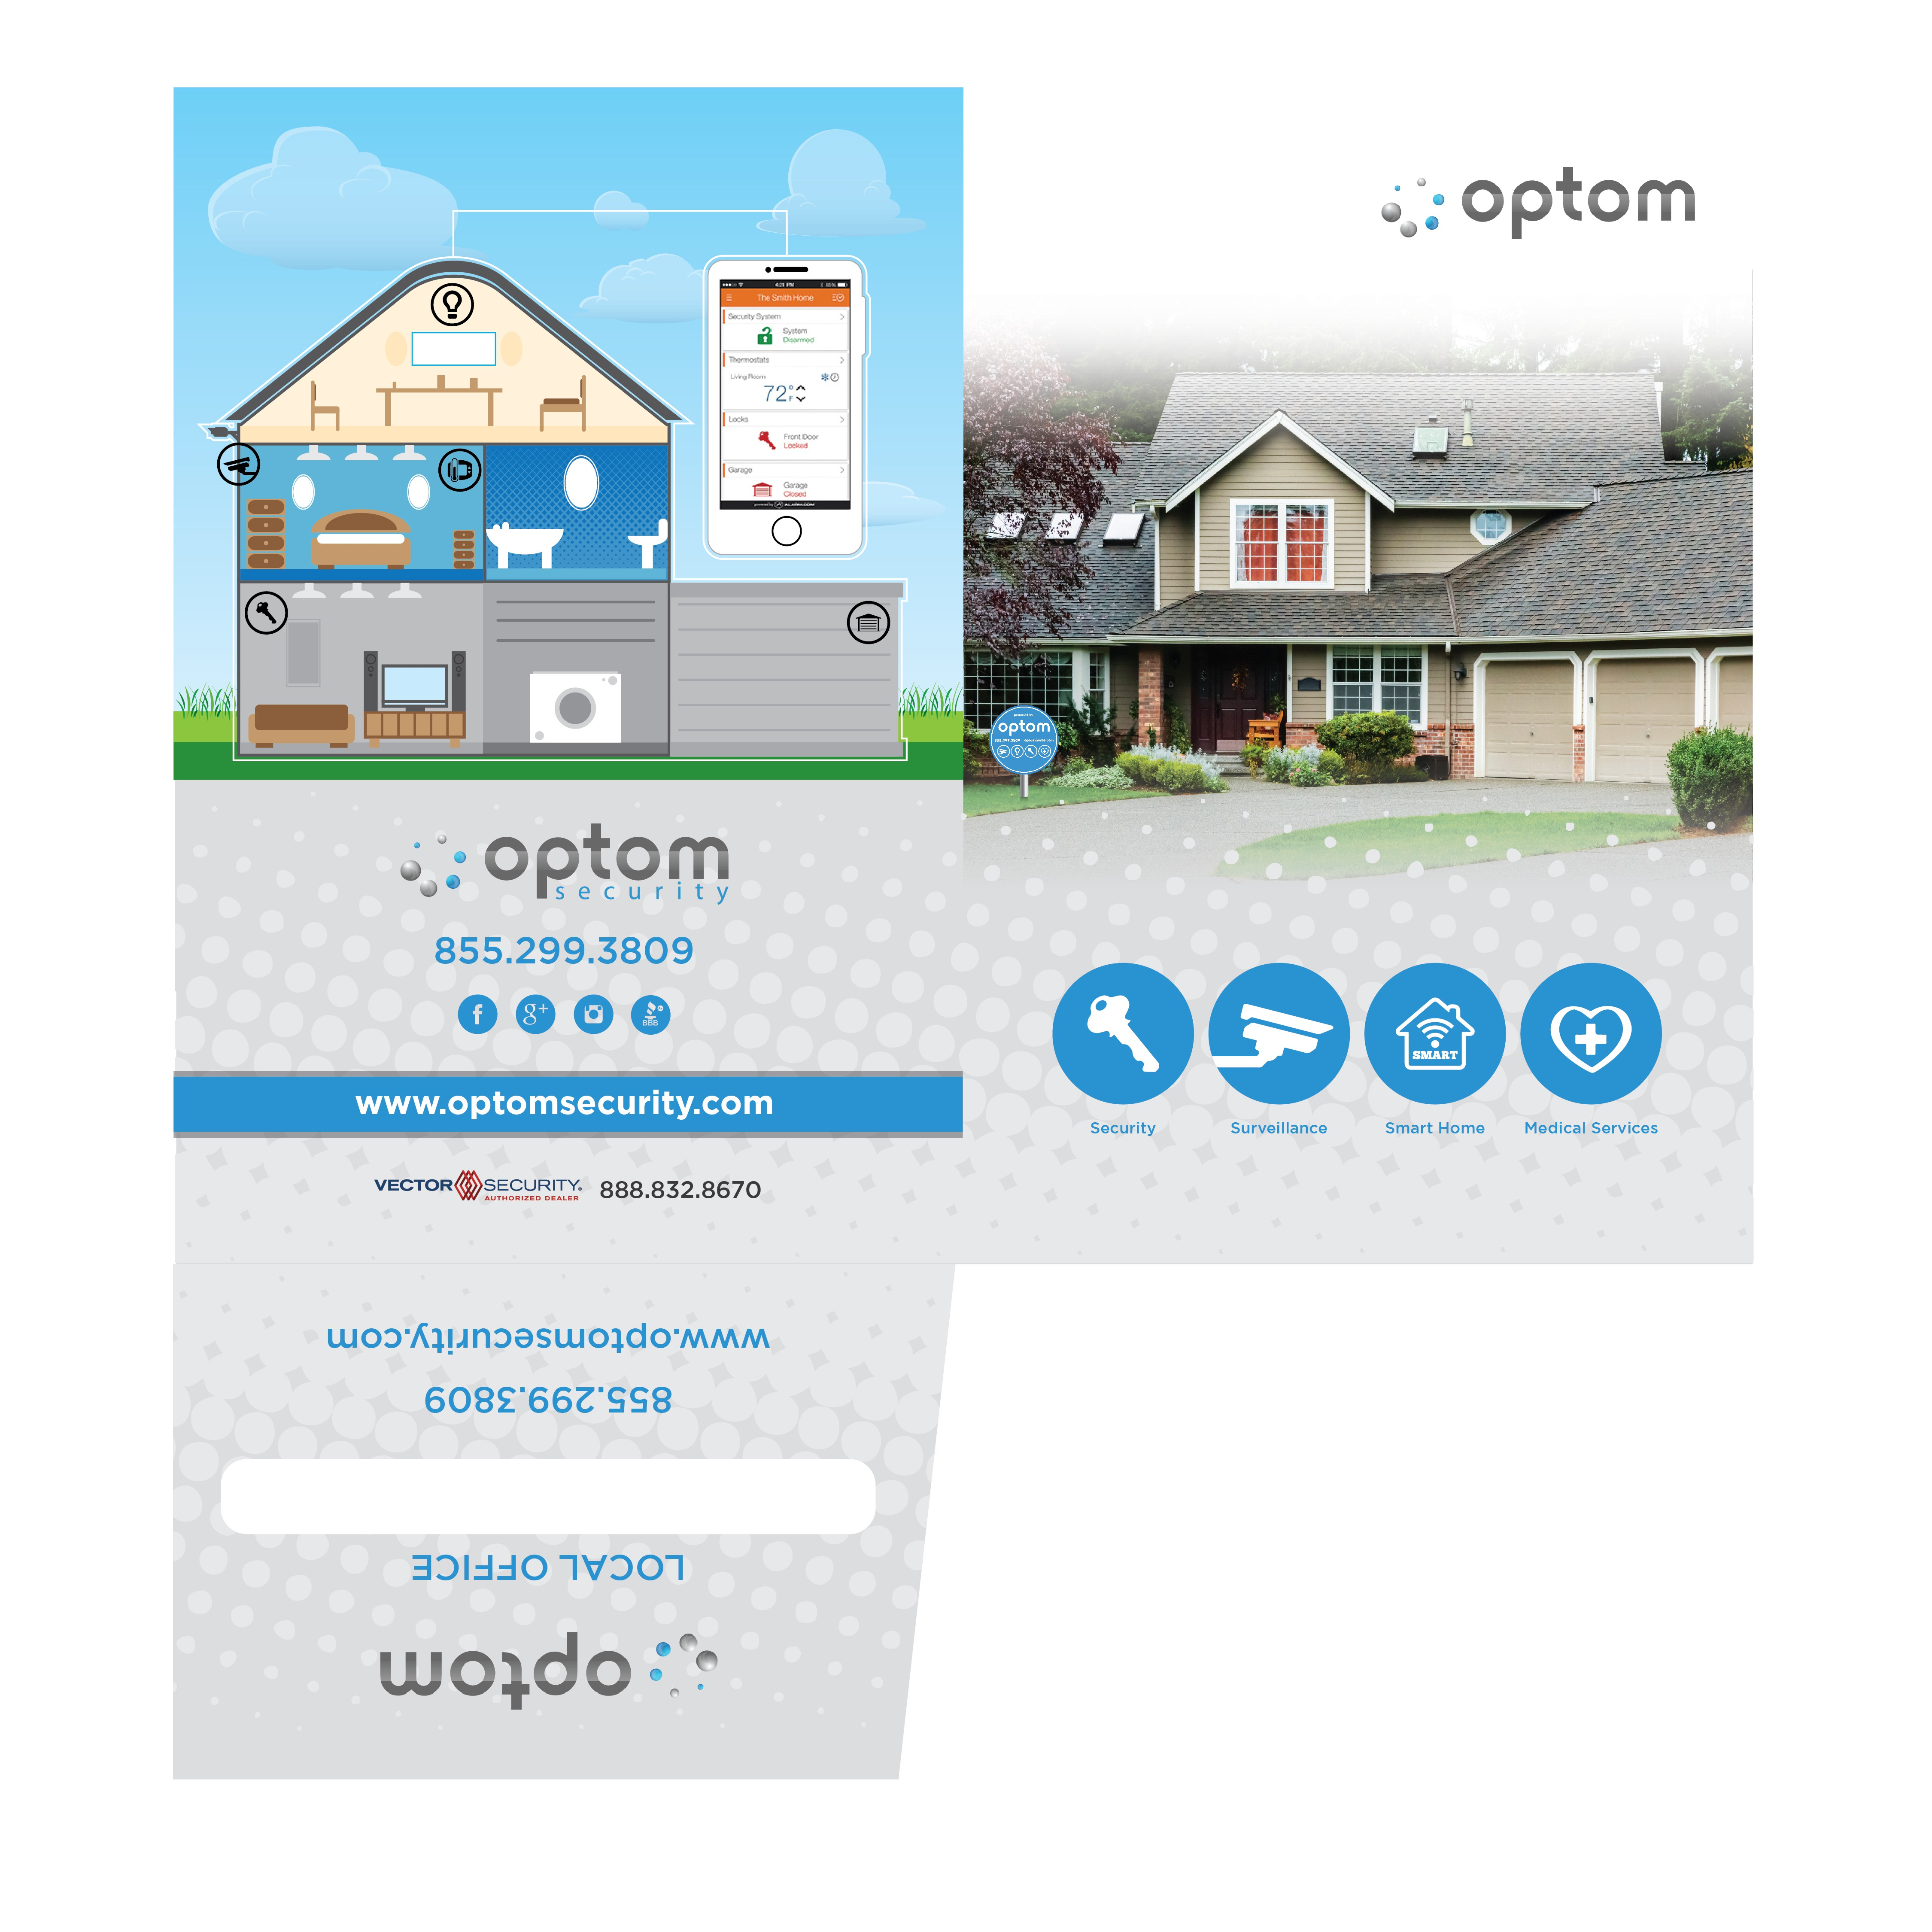 Brochure Revamp (design ideas attached)